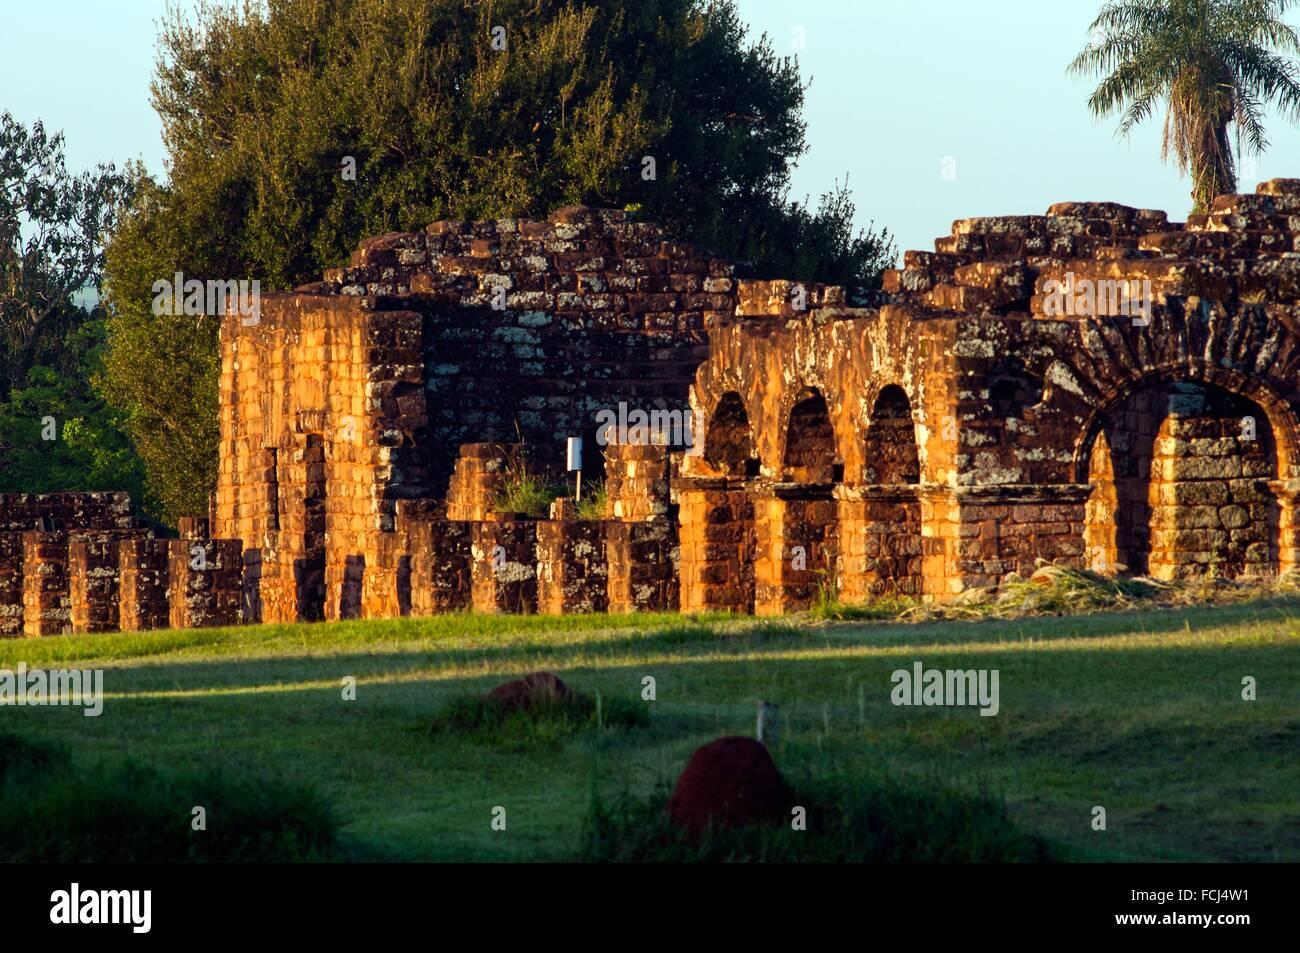 Abitazione chiostri, Missione Gesuita di La Santísima Trinidad de Paraná rovine, Encarnacion, Paraguay Immagini Stock